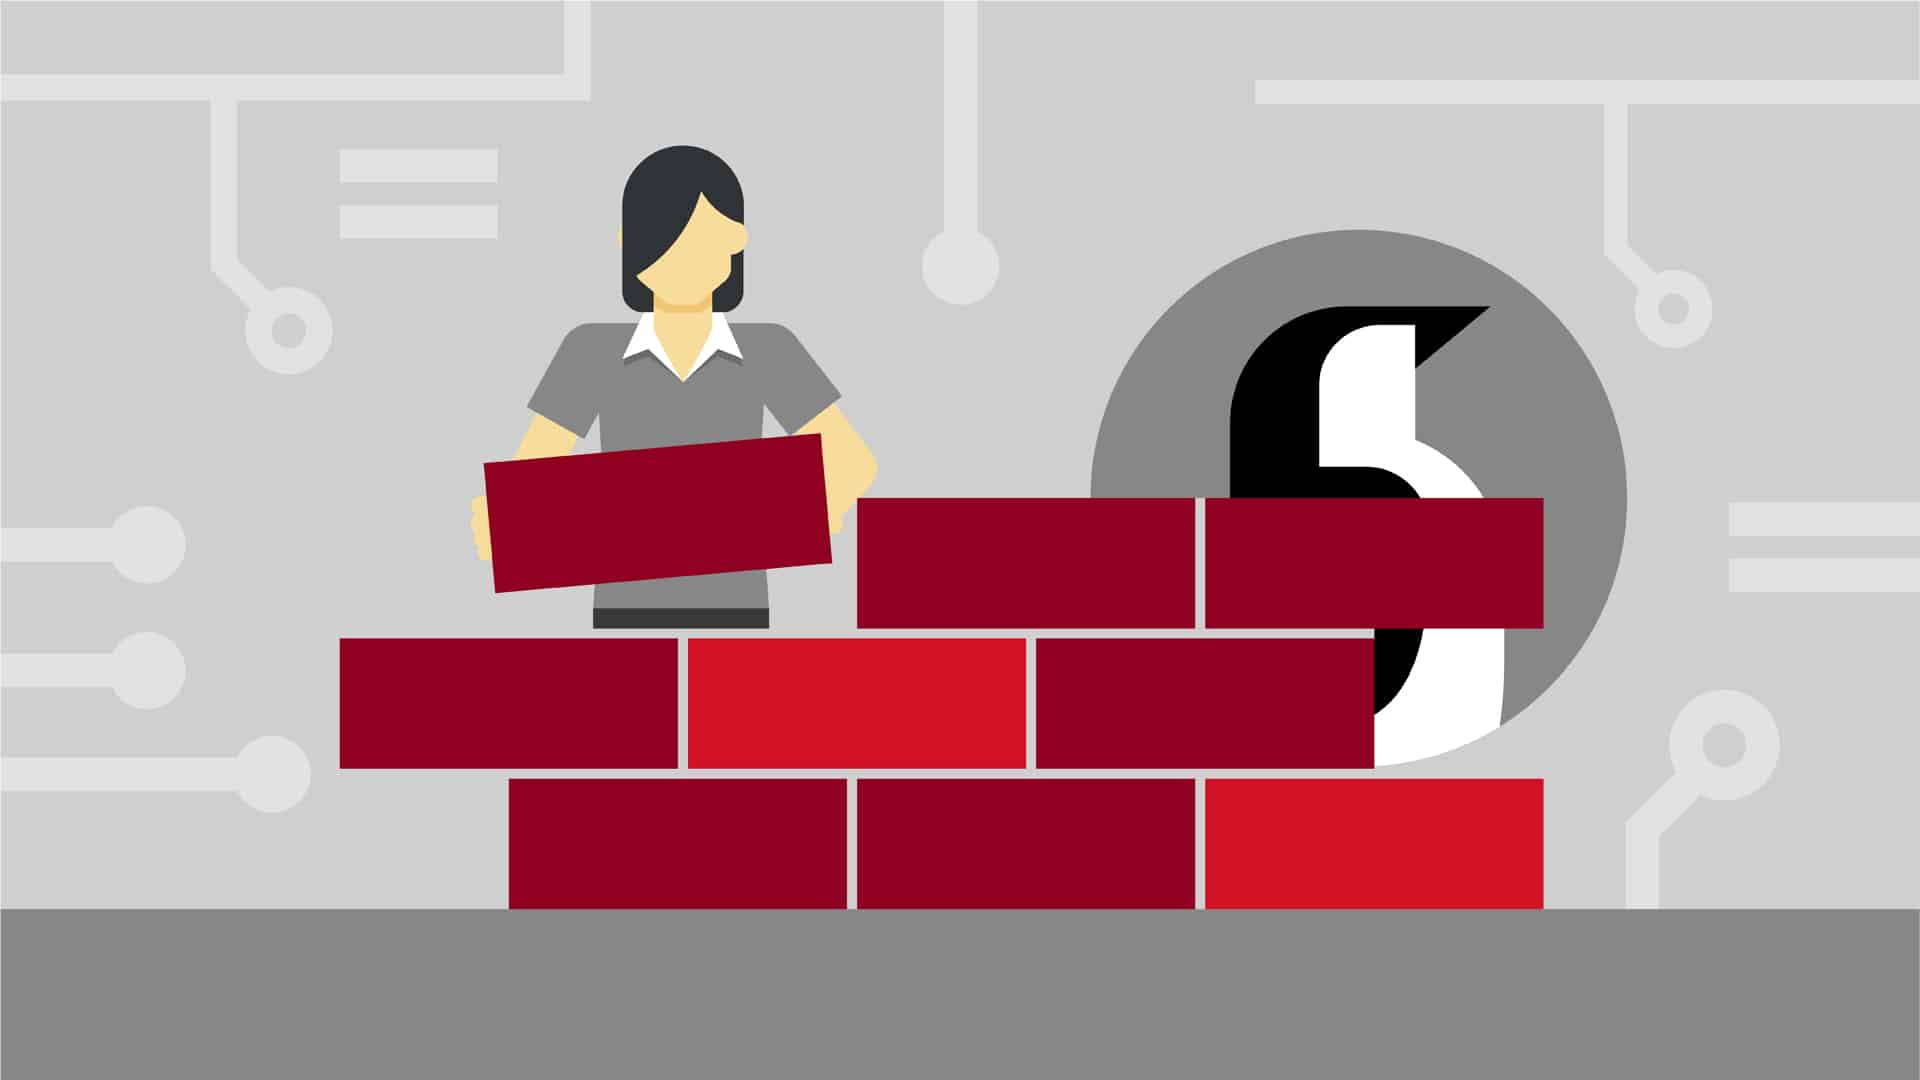 [Lynda] Linux: Firewalls and SELinux